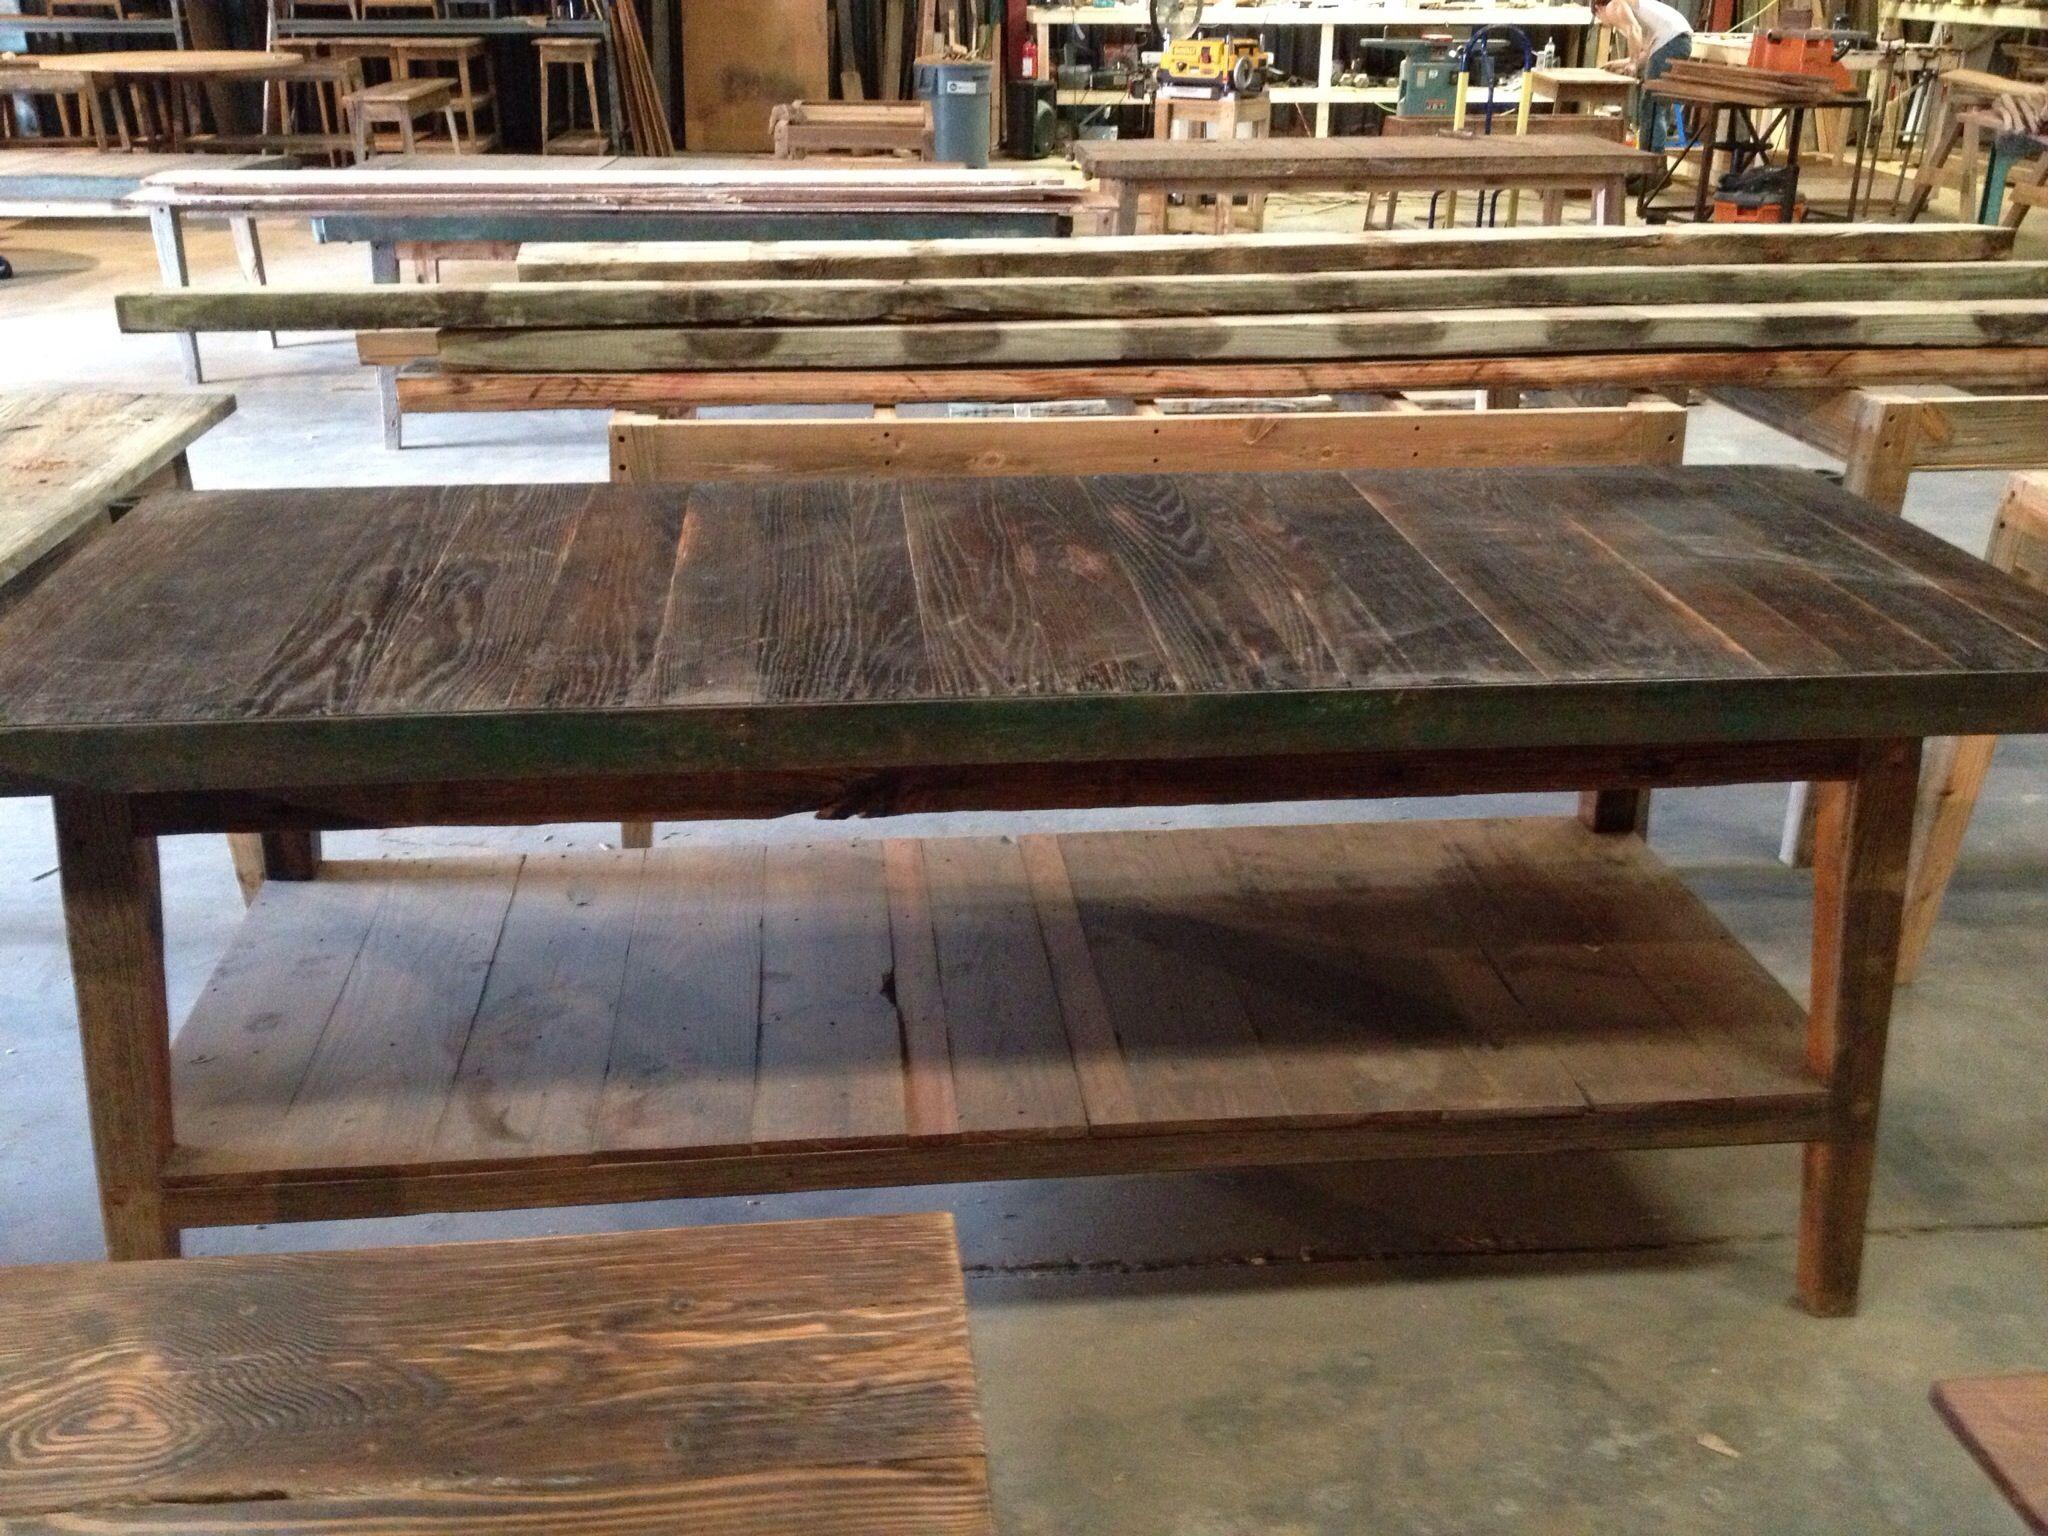 Marvelous Industrial Reclaimed Pallet Top With Low Shelf Made By Landrum Tables In Charleston  SC Http: Low ShelvesShelfCustom FurnitureCharleston ...